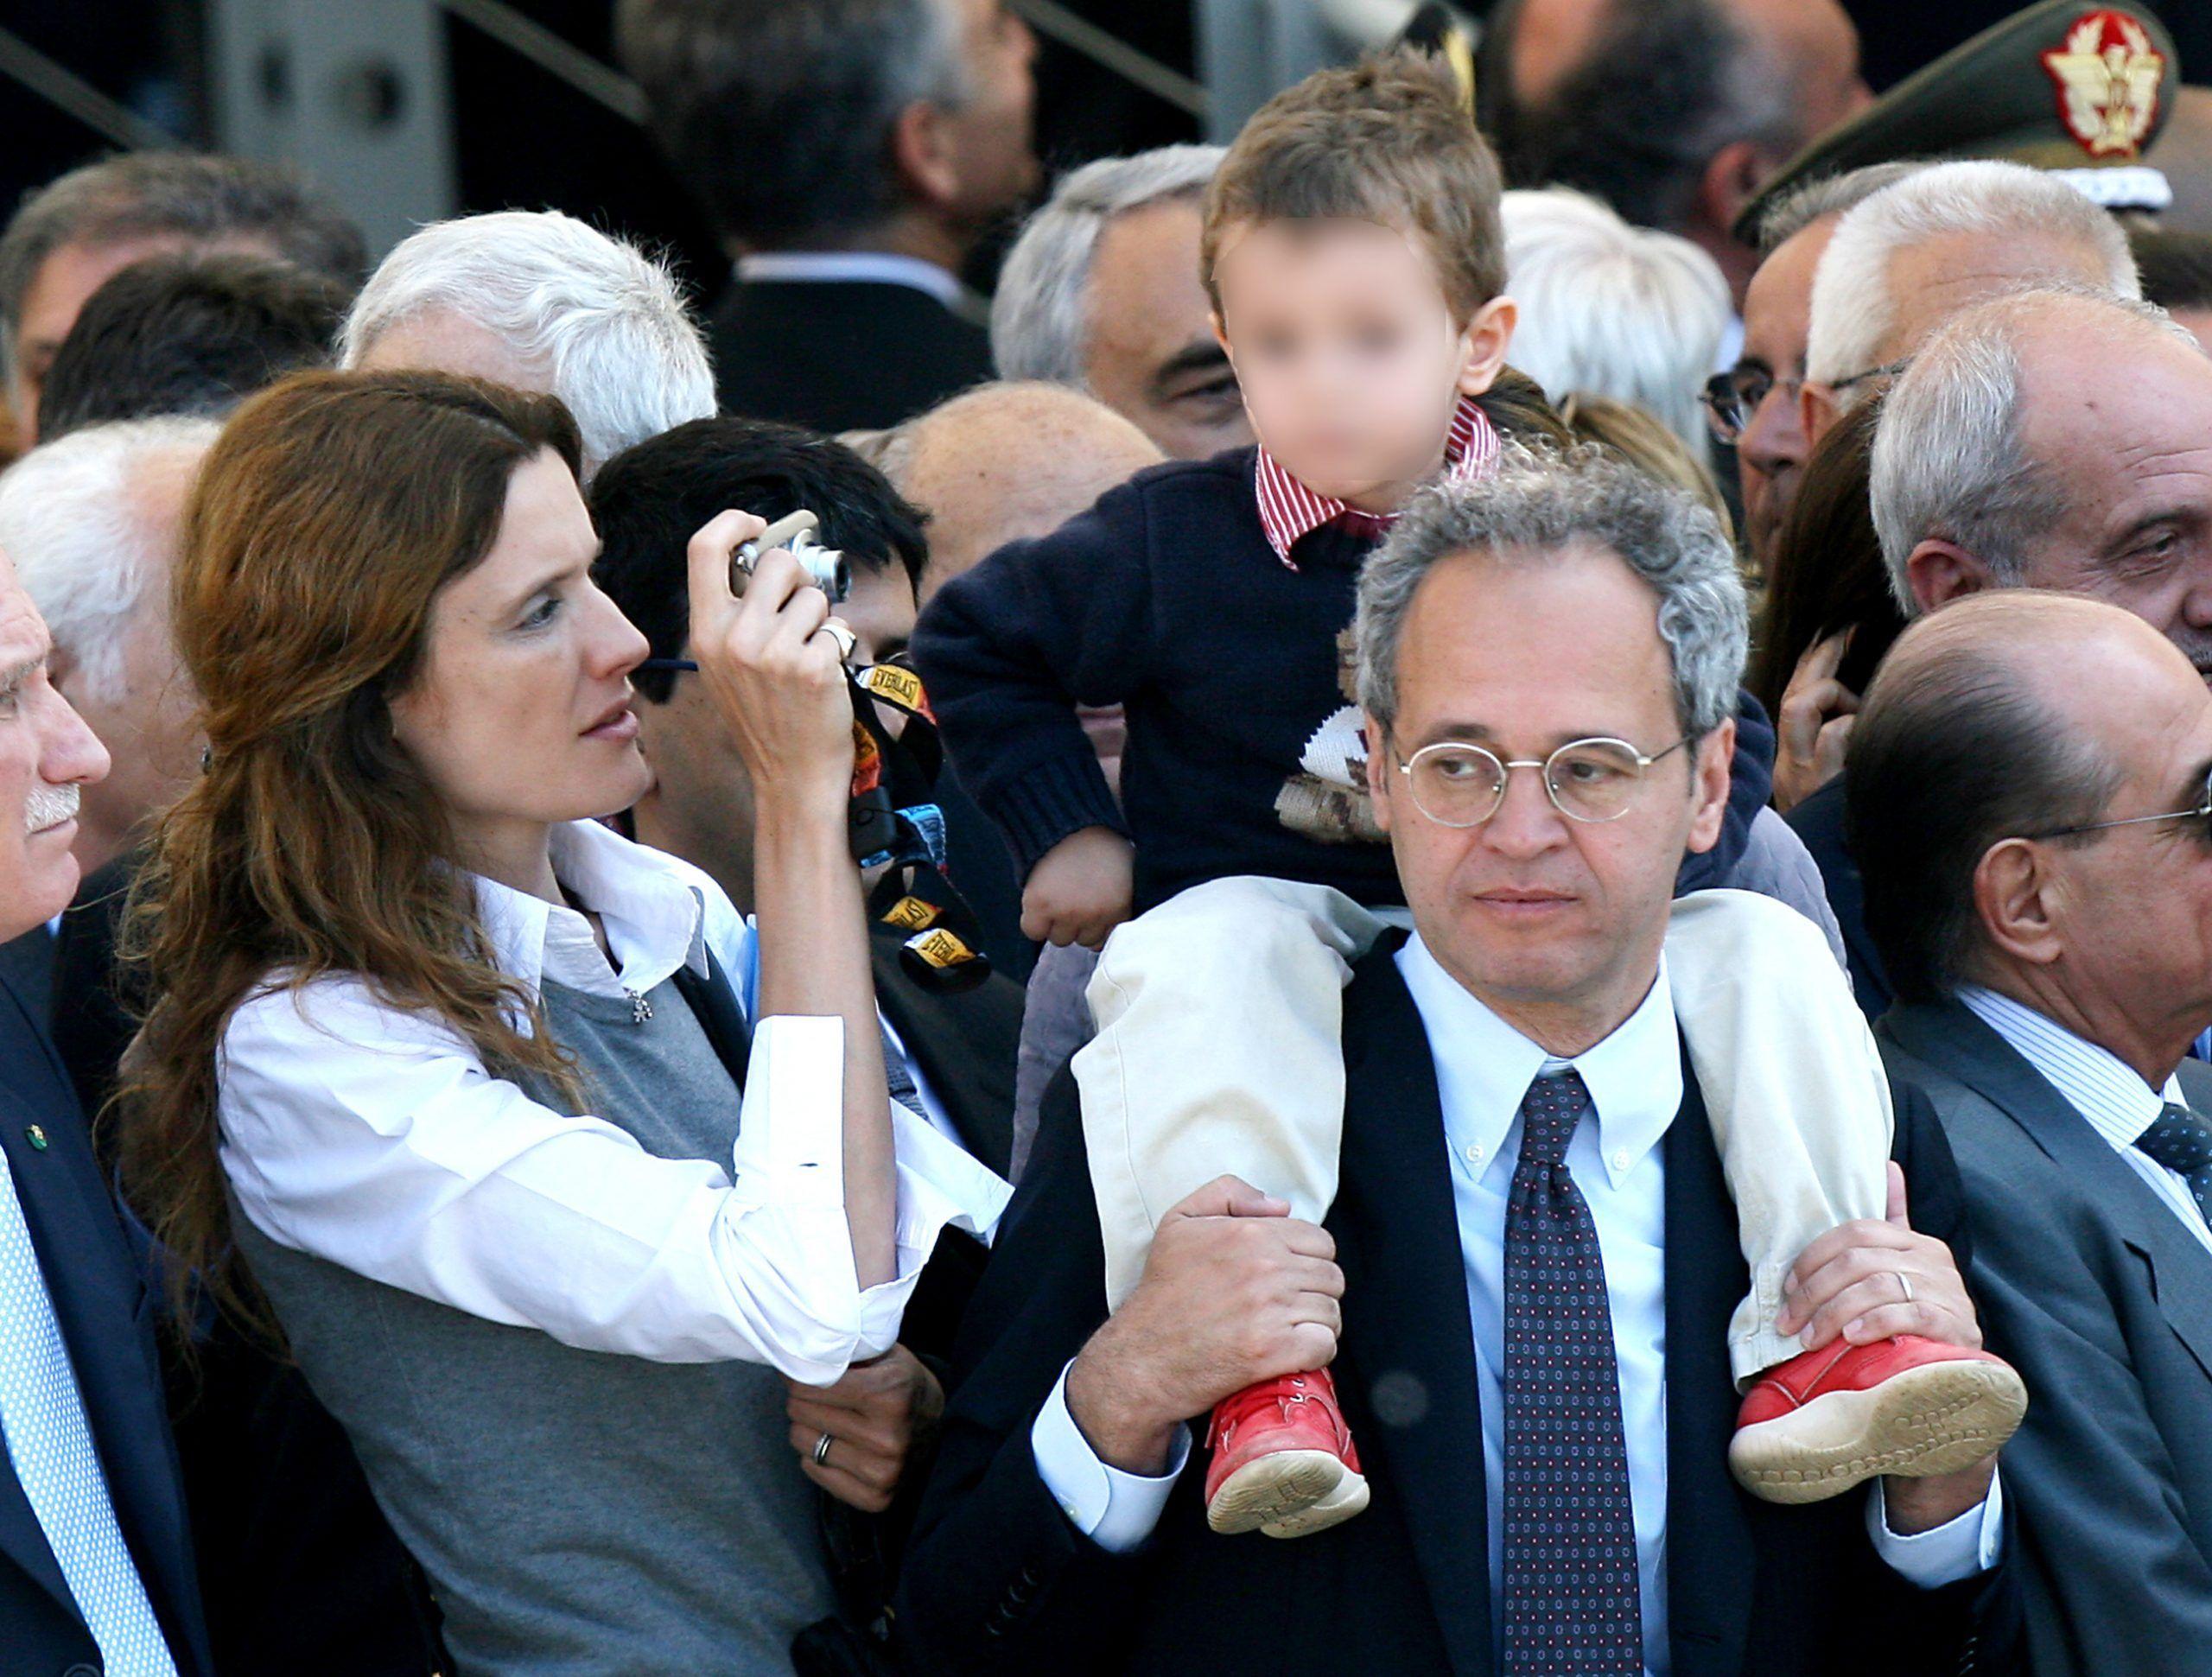 Michela Rocco di Torrepadula contro Mentana e Francesca Fagnani